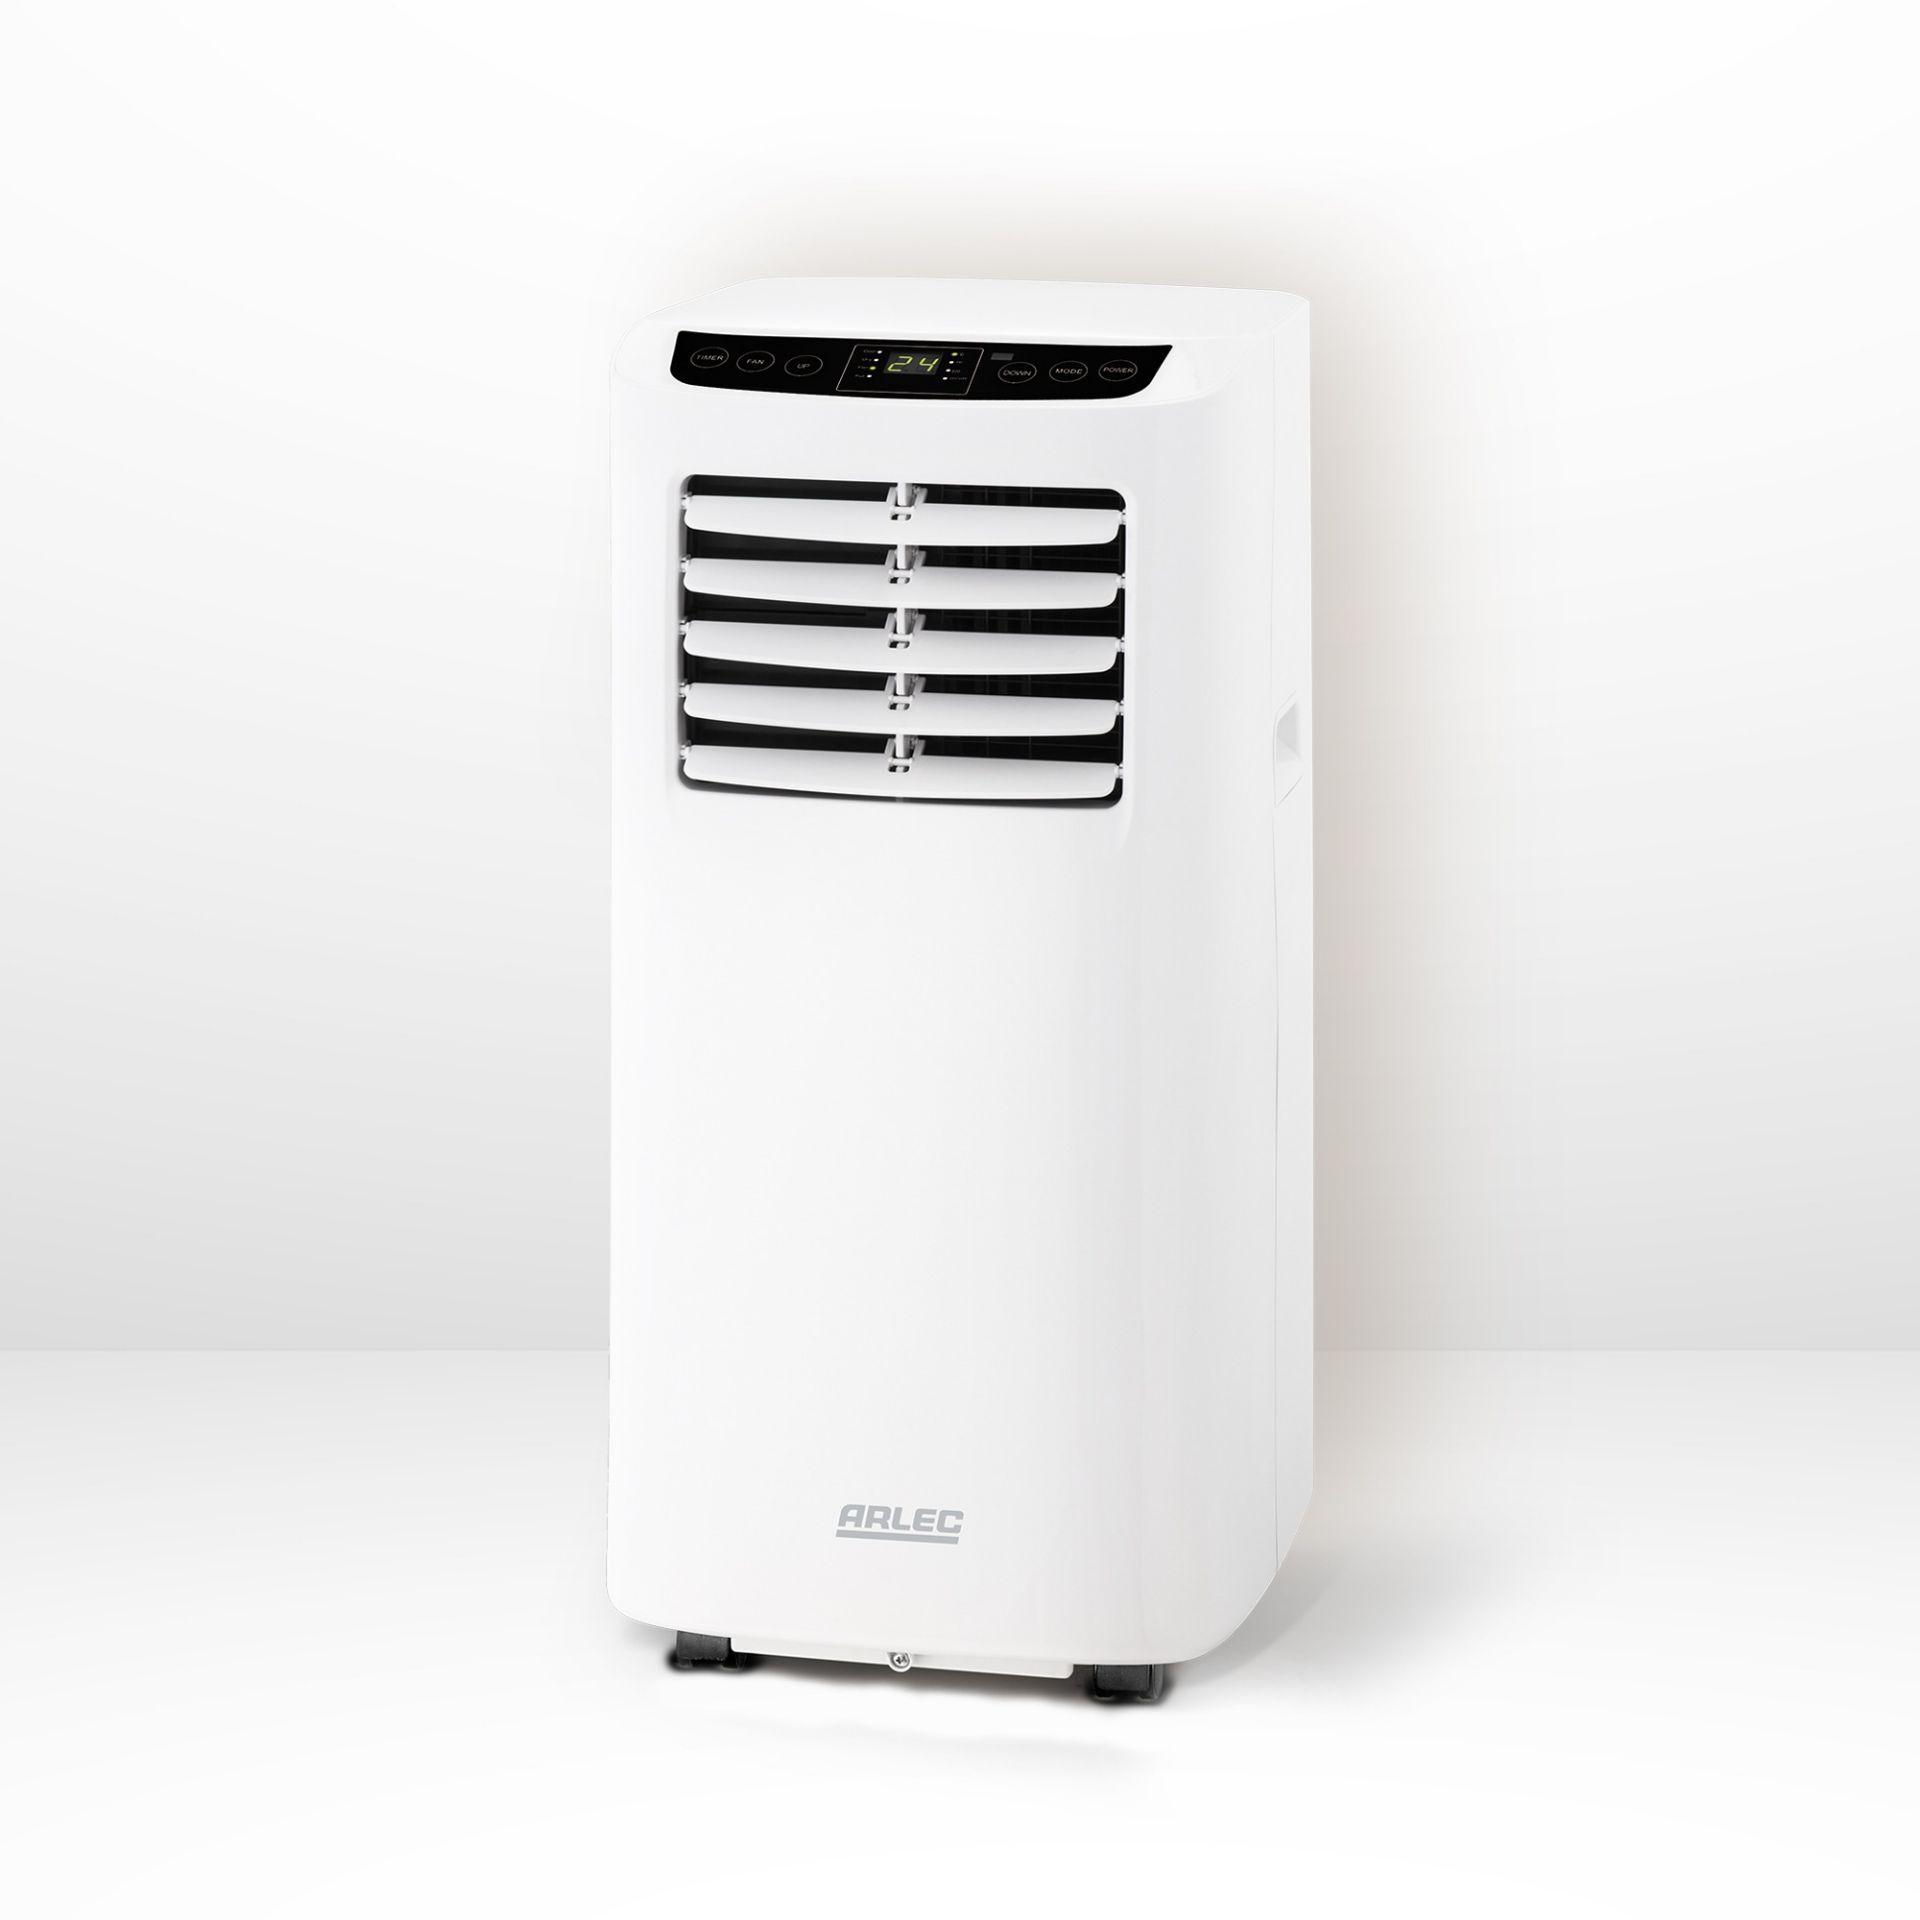 (P2) 1x Arlec Portable Air Conditioner 8000 BTU/h. RRP £400.00.